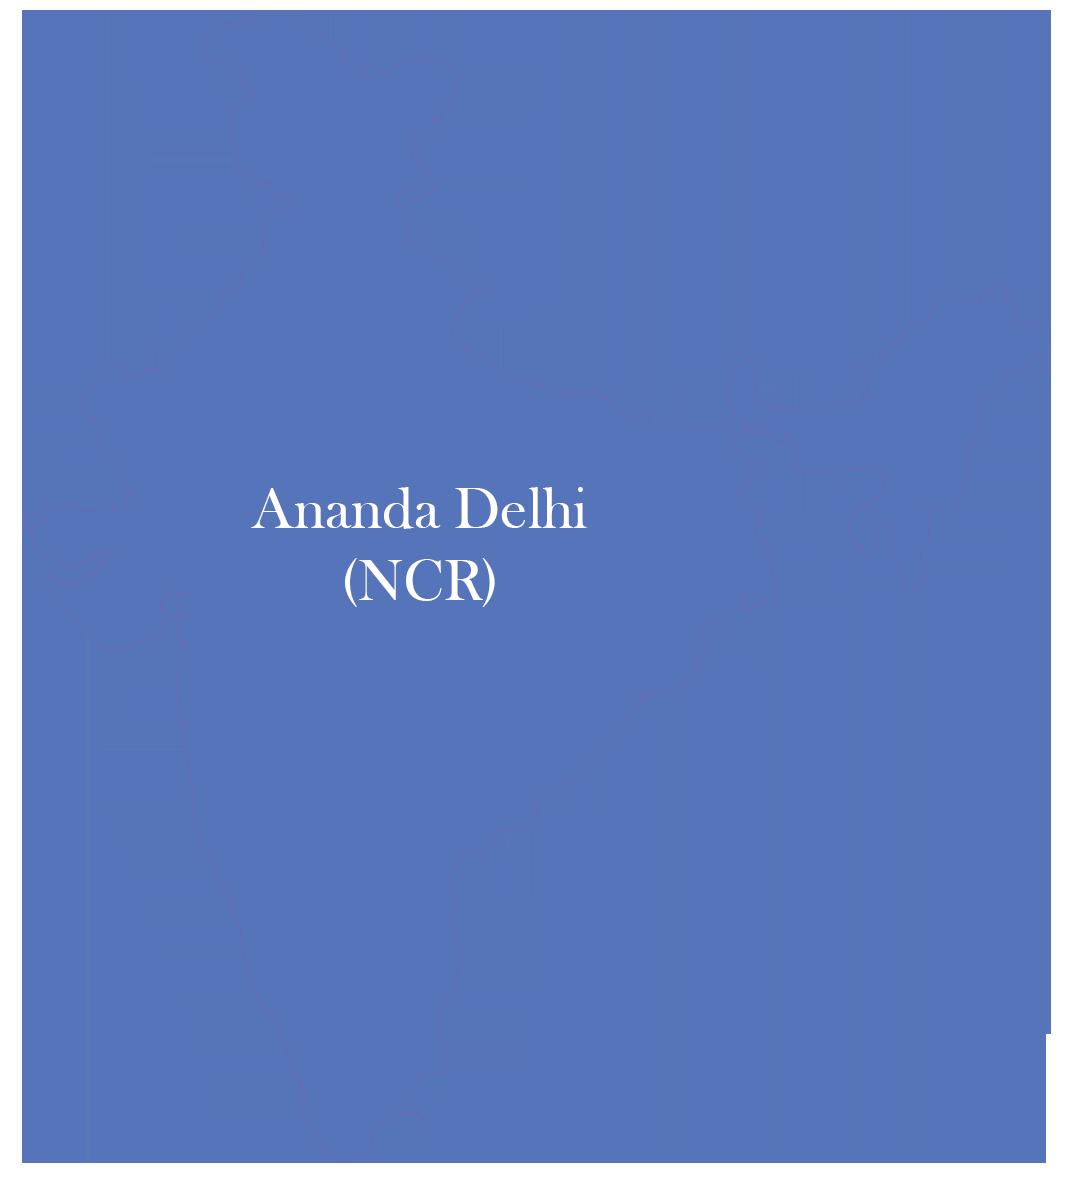 Ananda Delhi (NCR)